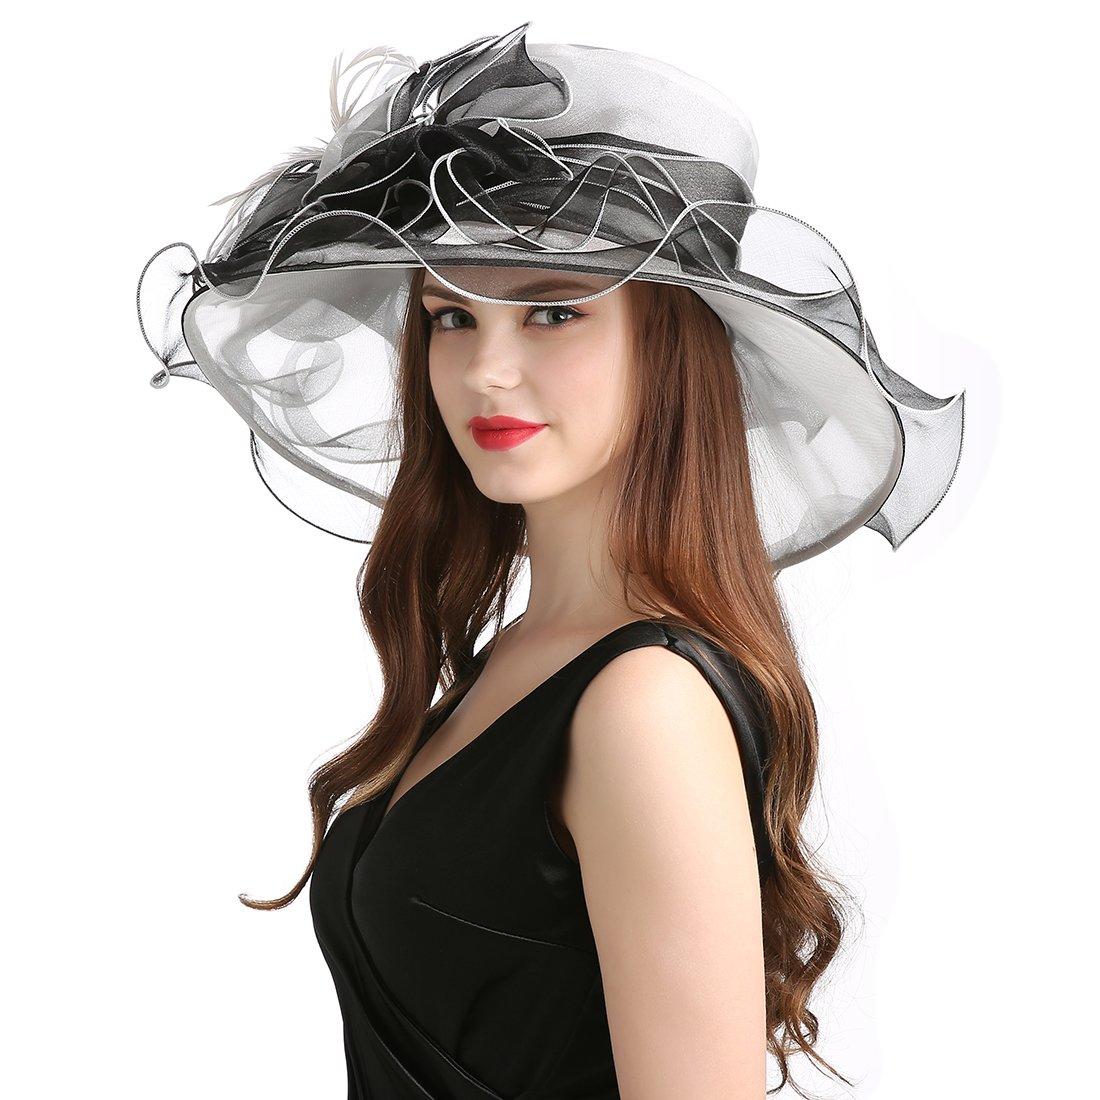 Women's Organza Church Derby Fascinator Cap Kentucky Tea Party Wedding Hat by MissCynthia